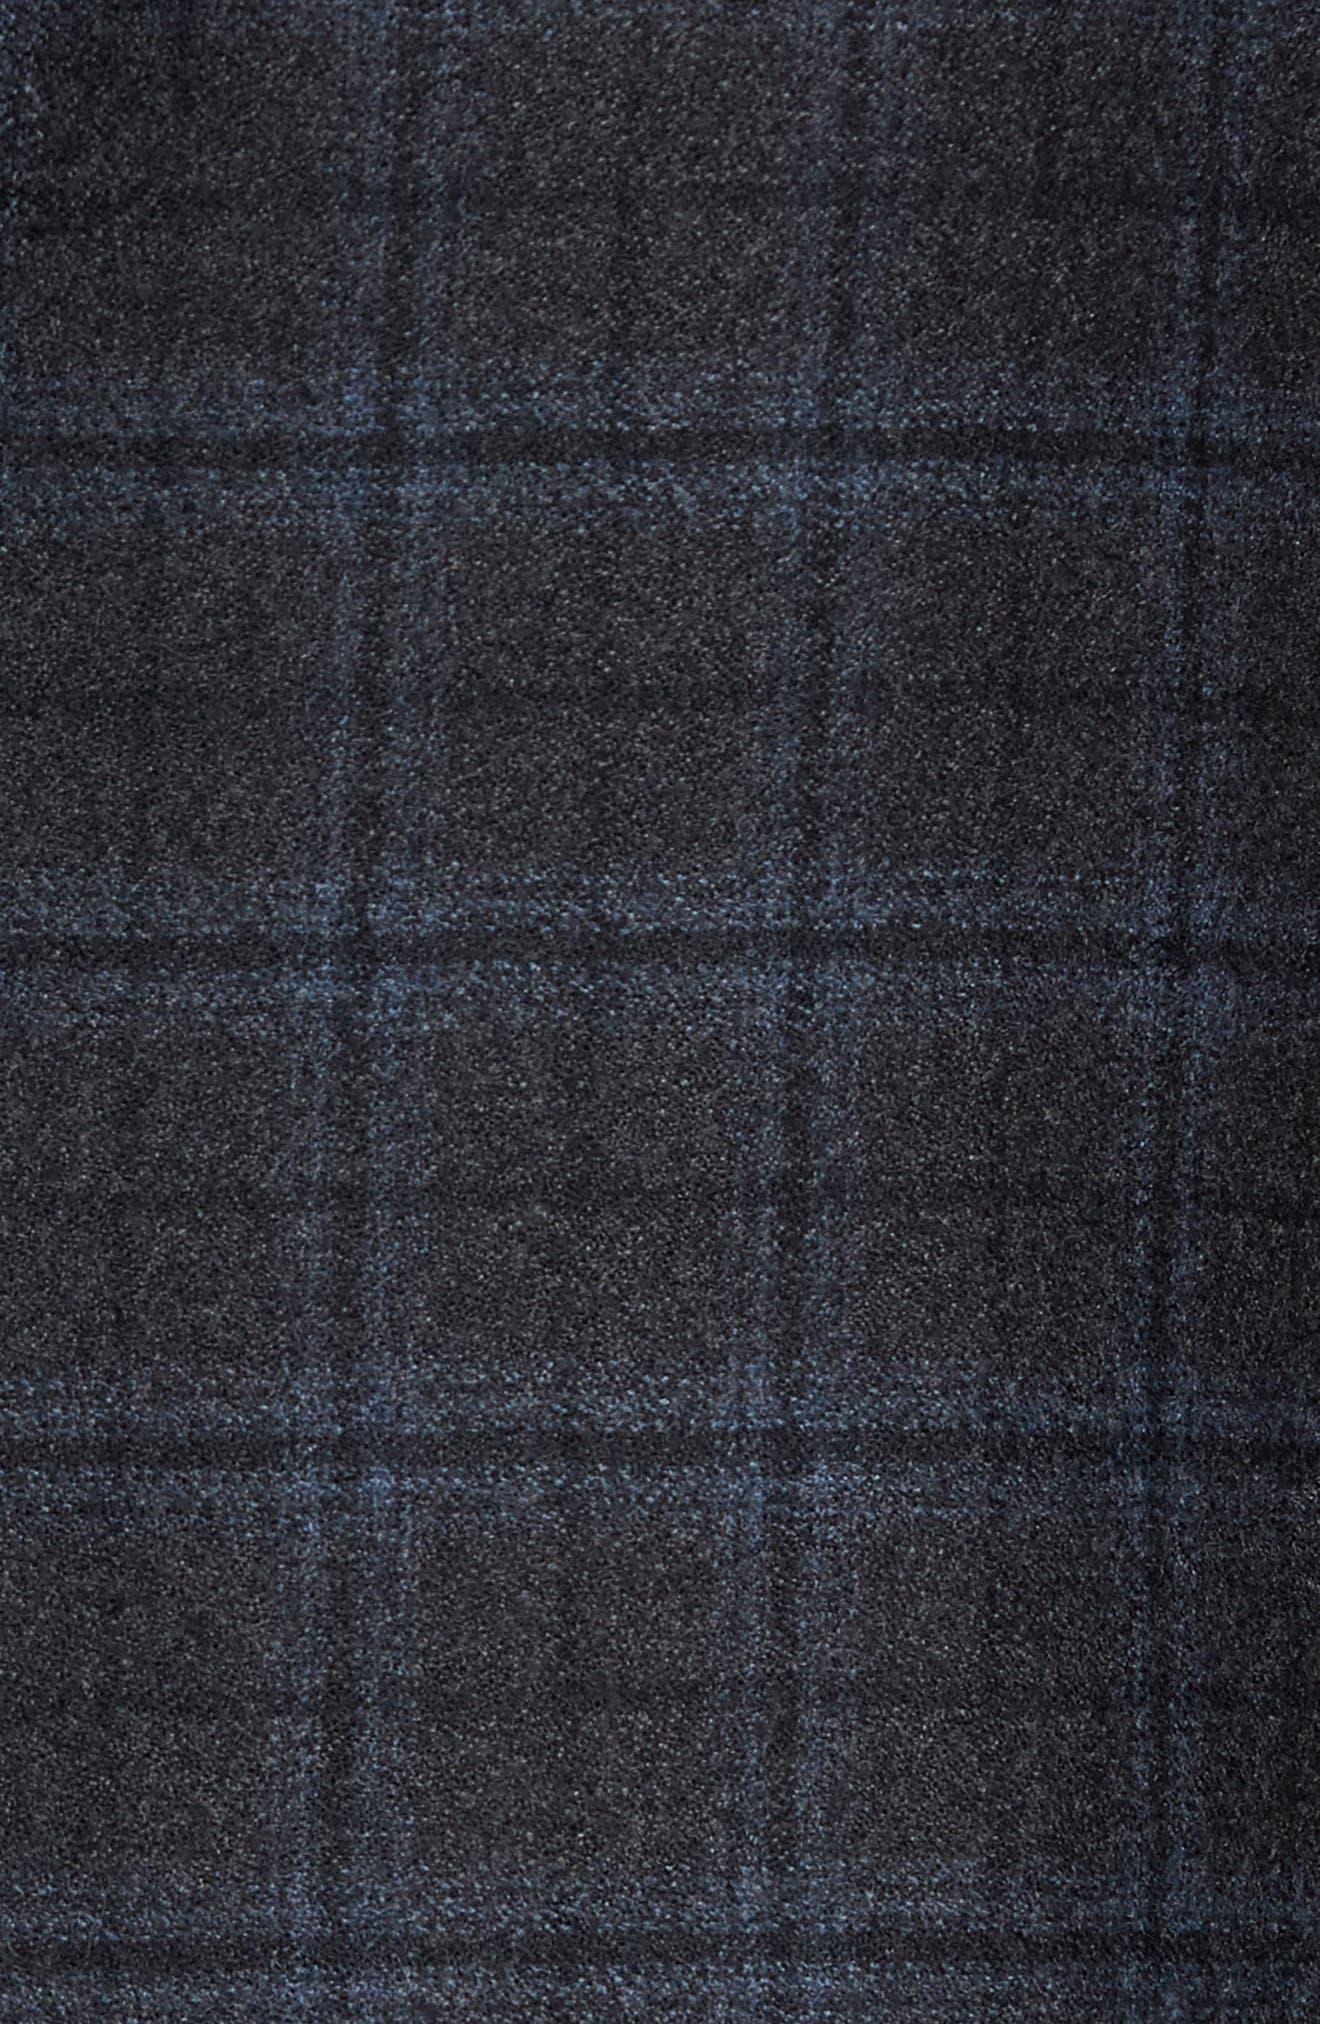 Konan Trim Fit Plaid Wool Sport Coat,                             Alternate thumbnail 6, color,                             020